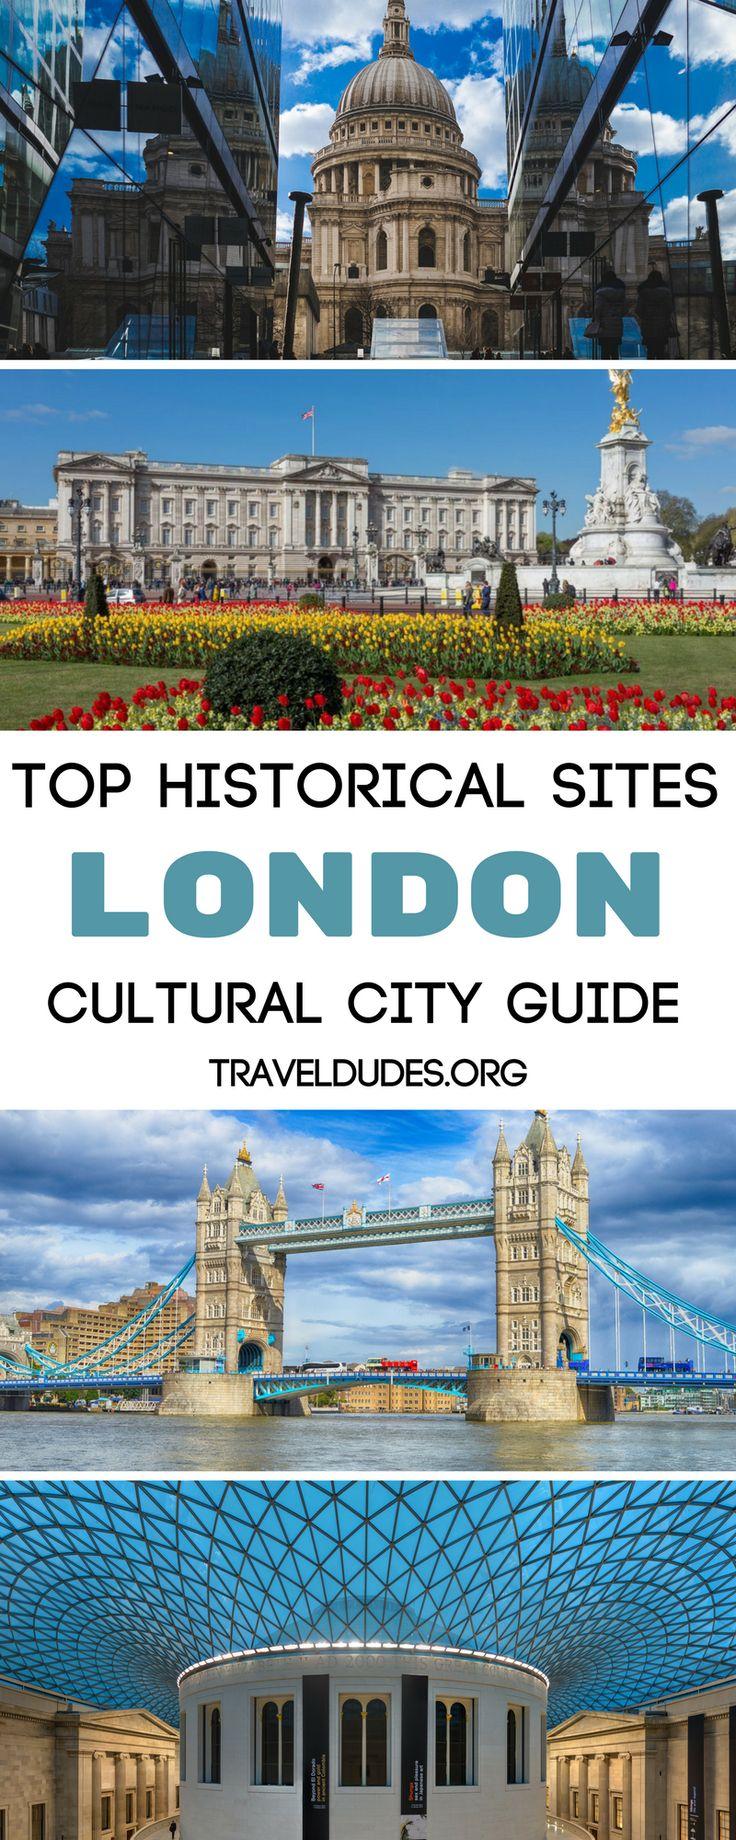 Best 25 london travel ideas on pinterest travel england london best 25 london travel ideas on pinterest travel england london england and london tips solutioingenieria Image collections